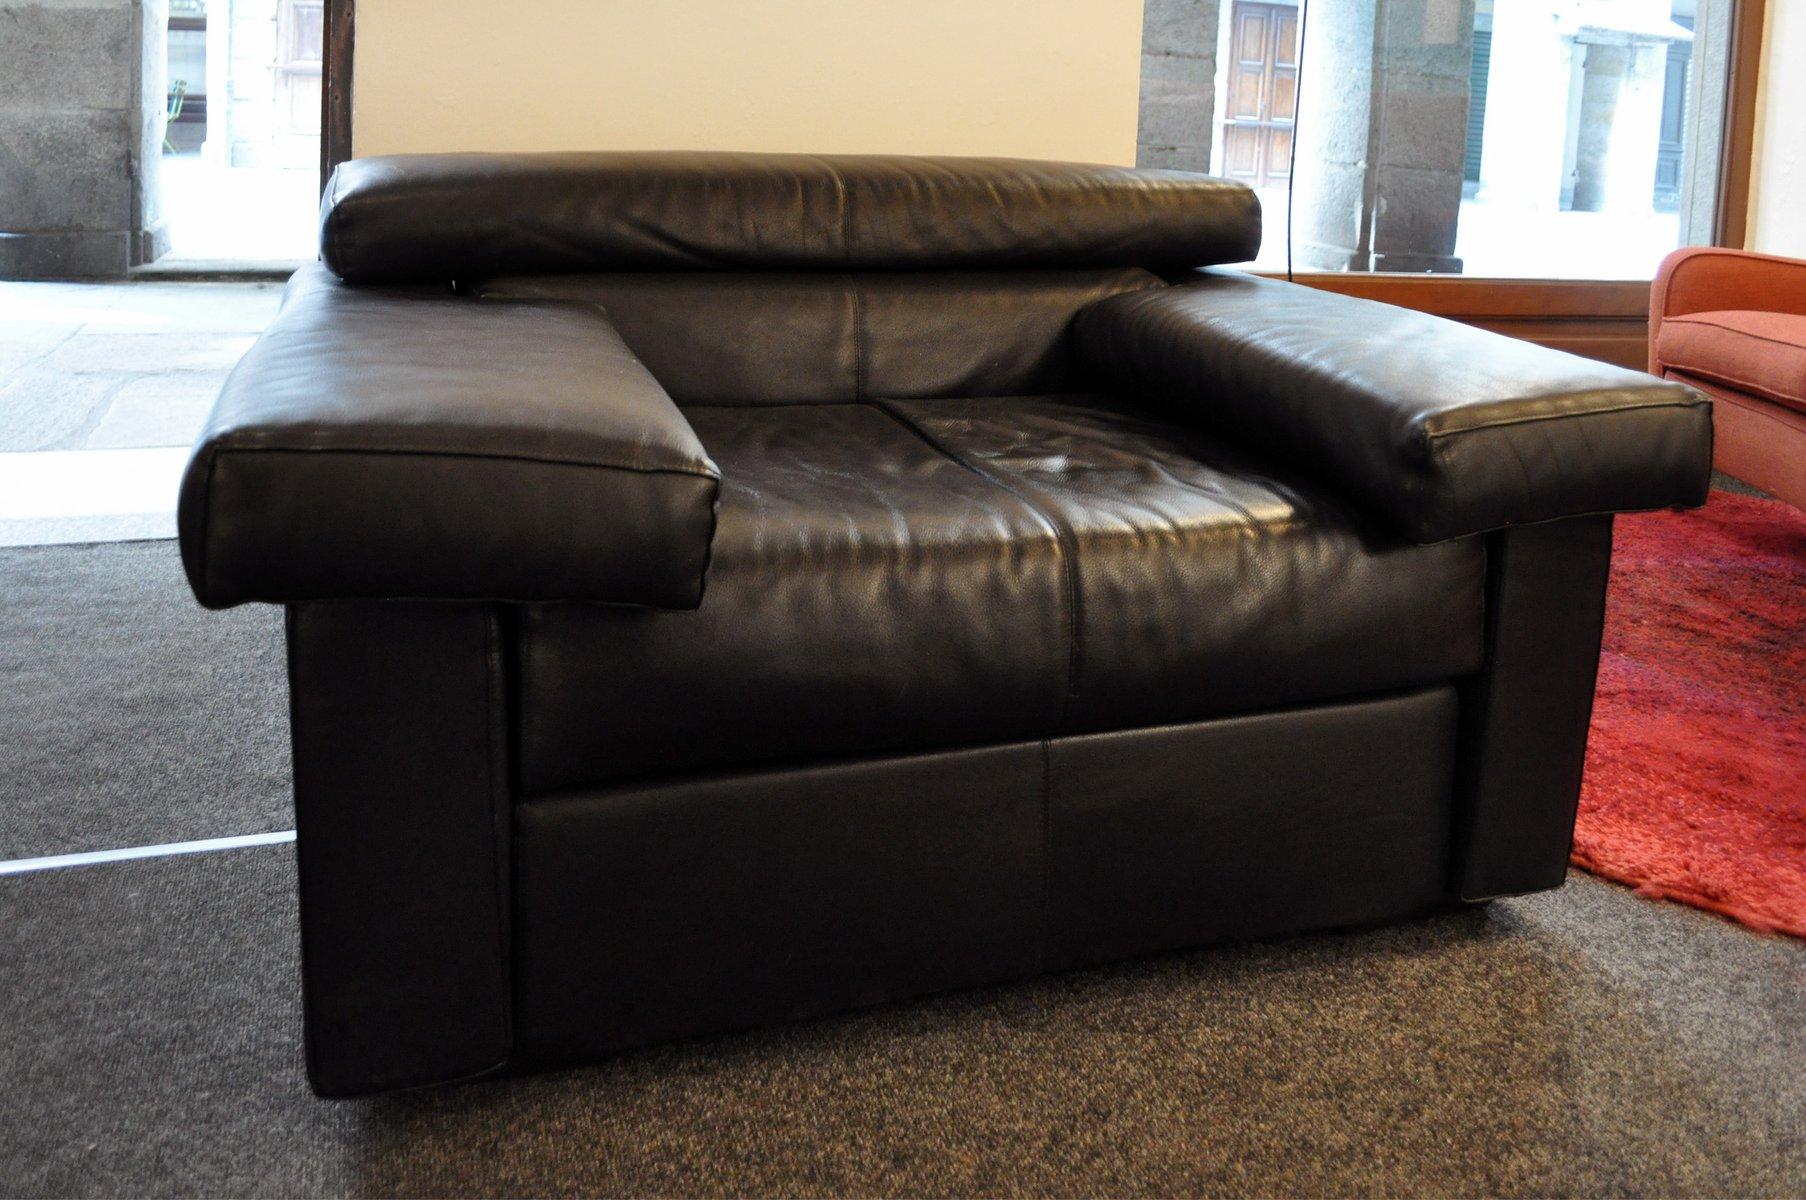 modell erasmo leder sofa sessel von tobia afra scarpa f r b b italia 1980er bei pamono kaufen. Black Bedroom Furniture Sets. Home Design Ideas